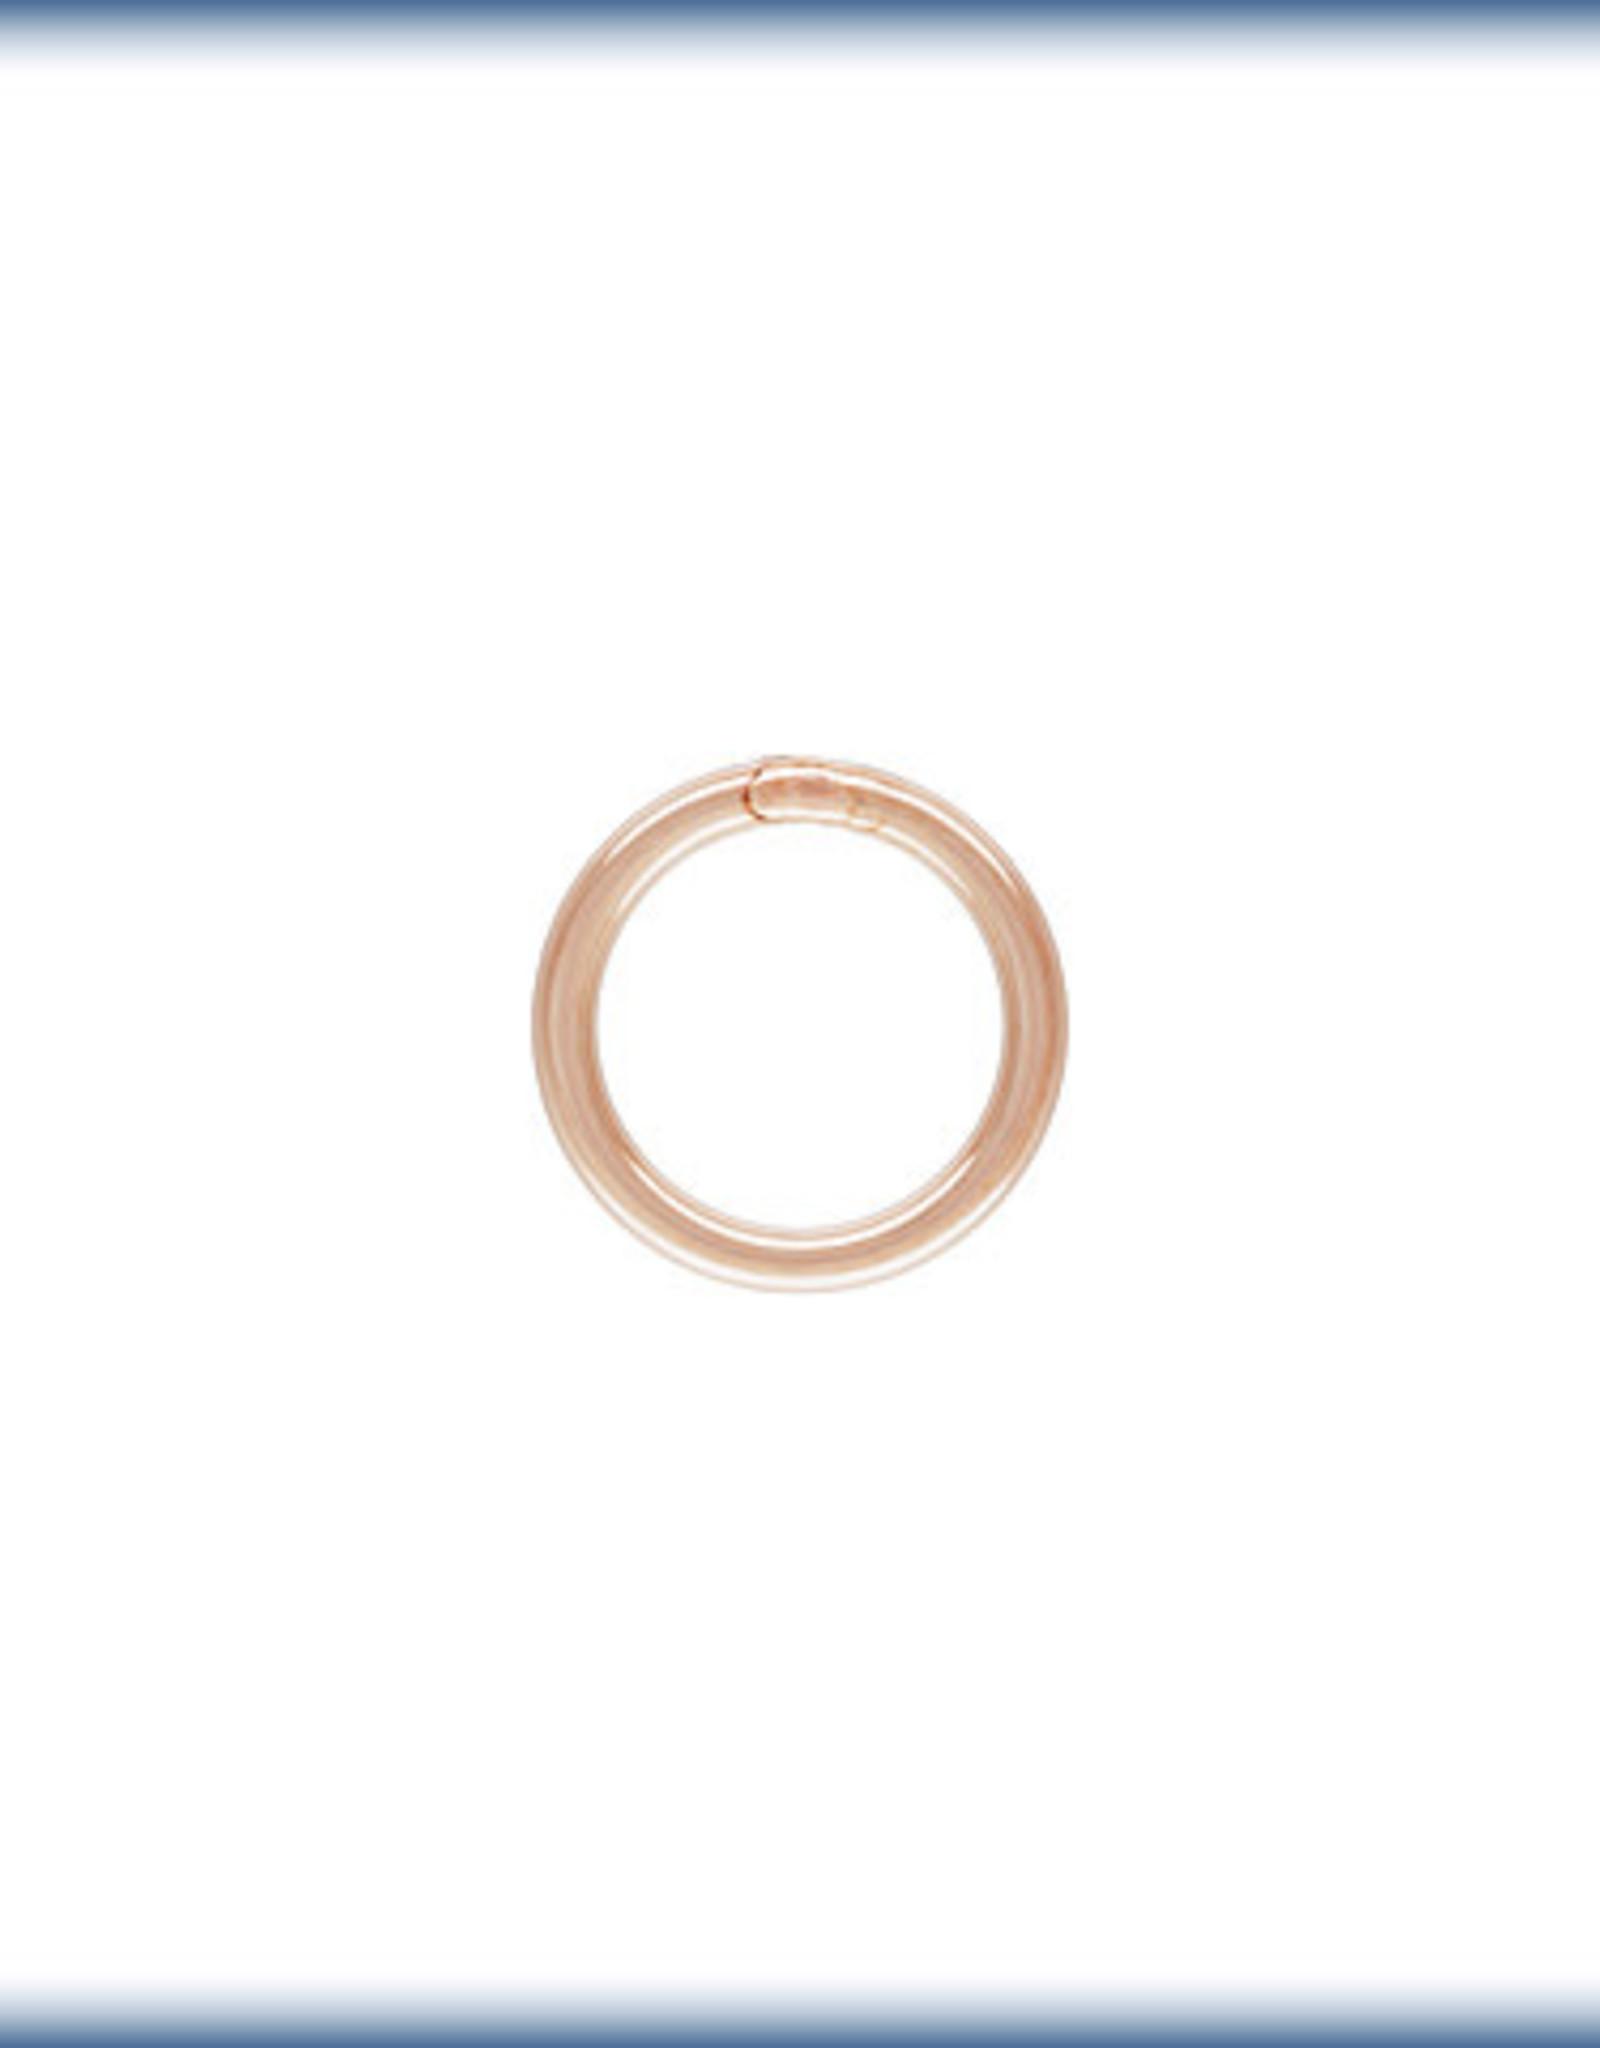 5mm Closed Ring 22ga, 14k Rose Gold Filled Qty 12